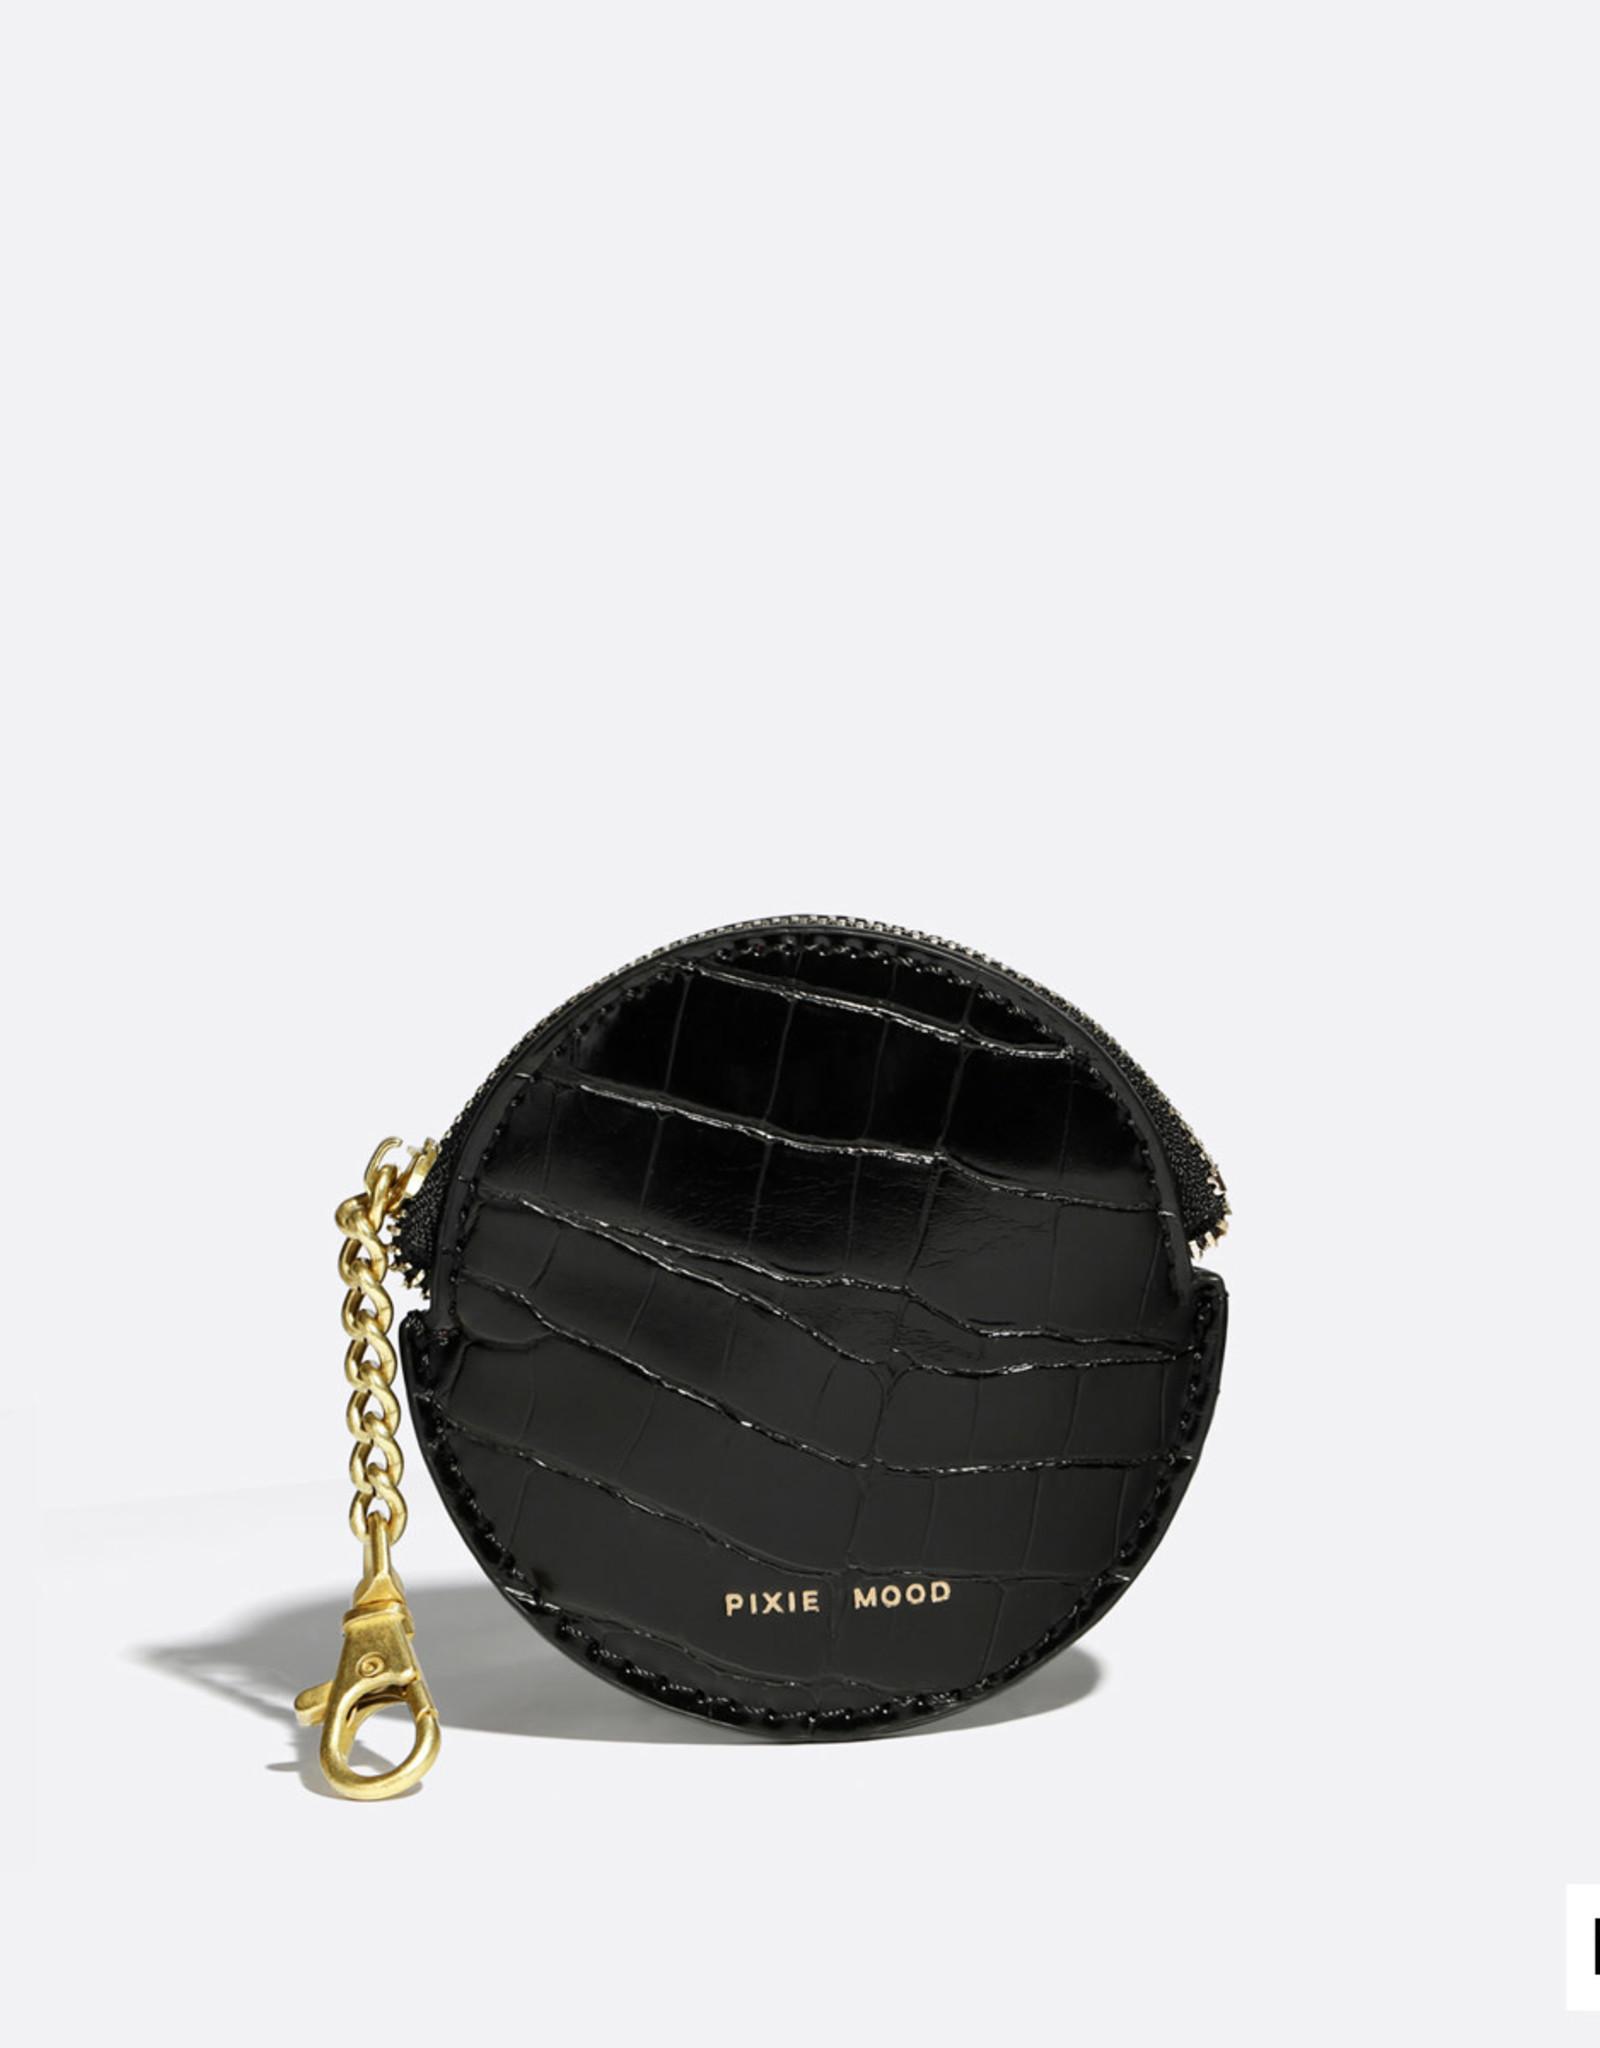 Pixie Mood Porte-monnaie Monica - Noir croco